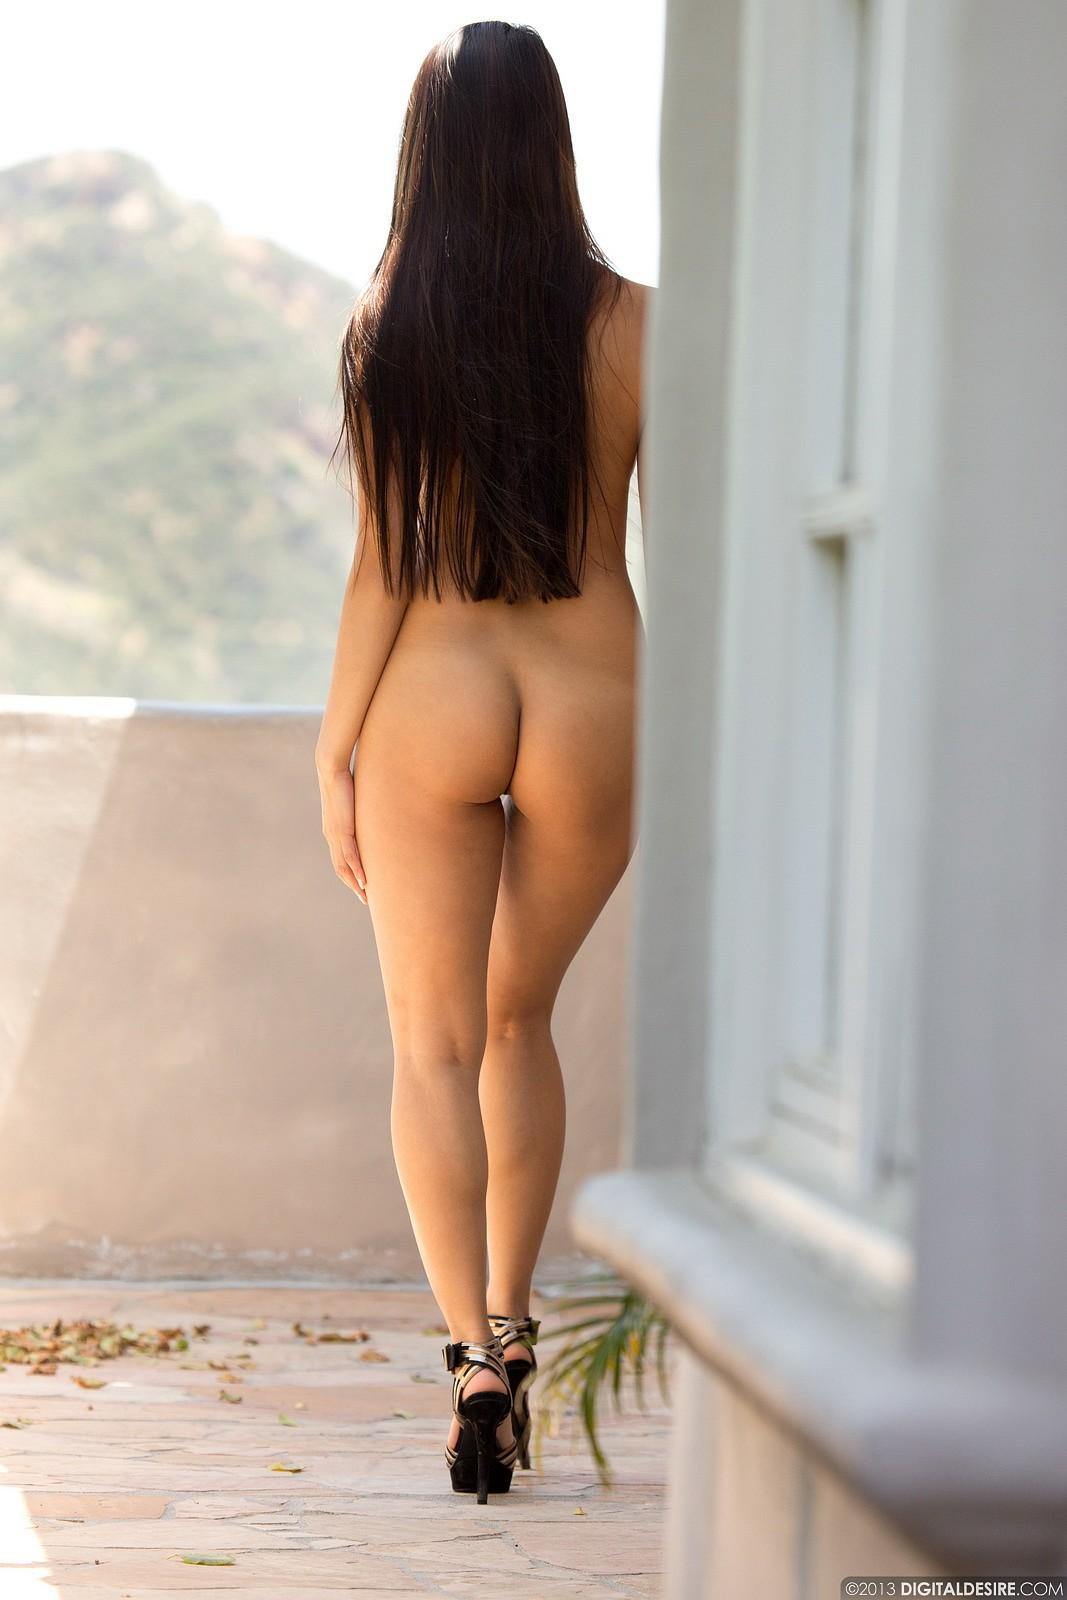 Sharon Lee, asian, nude, busty, ass, coffee, balcony